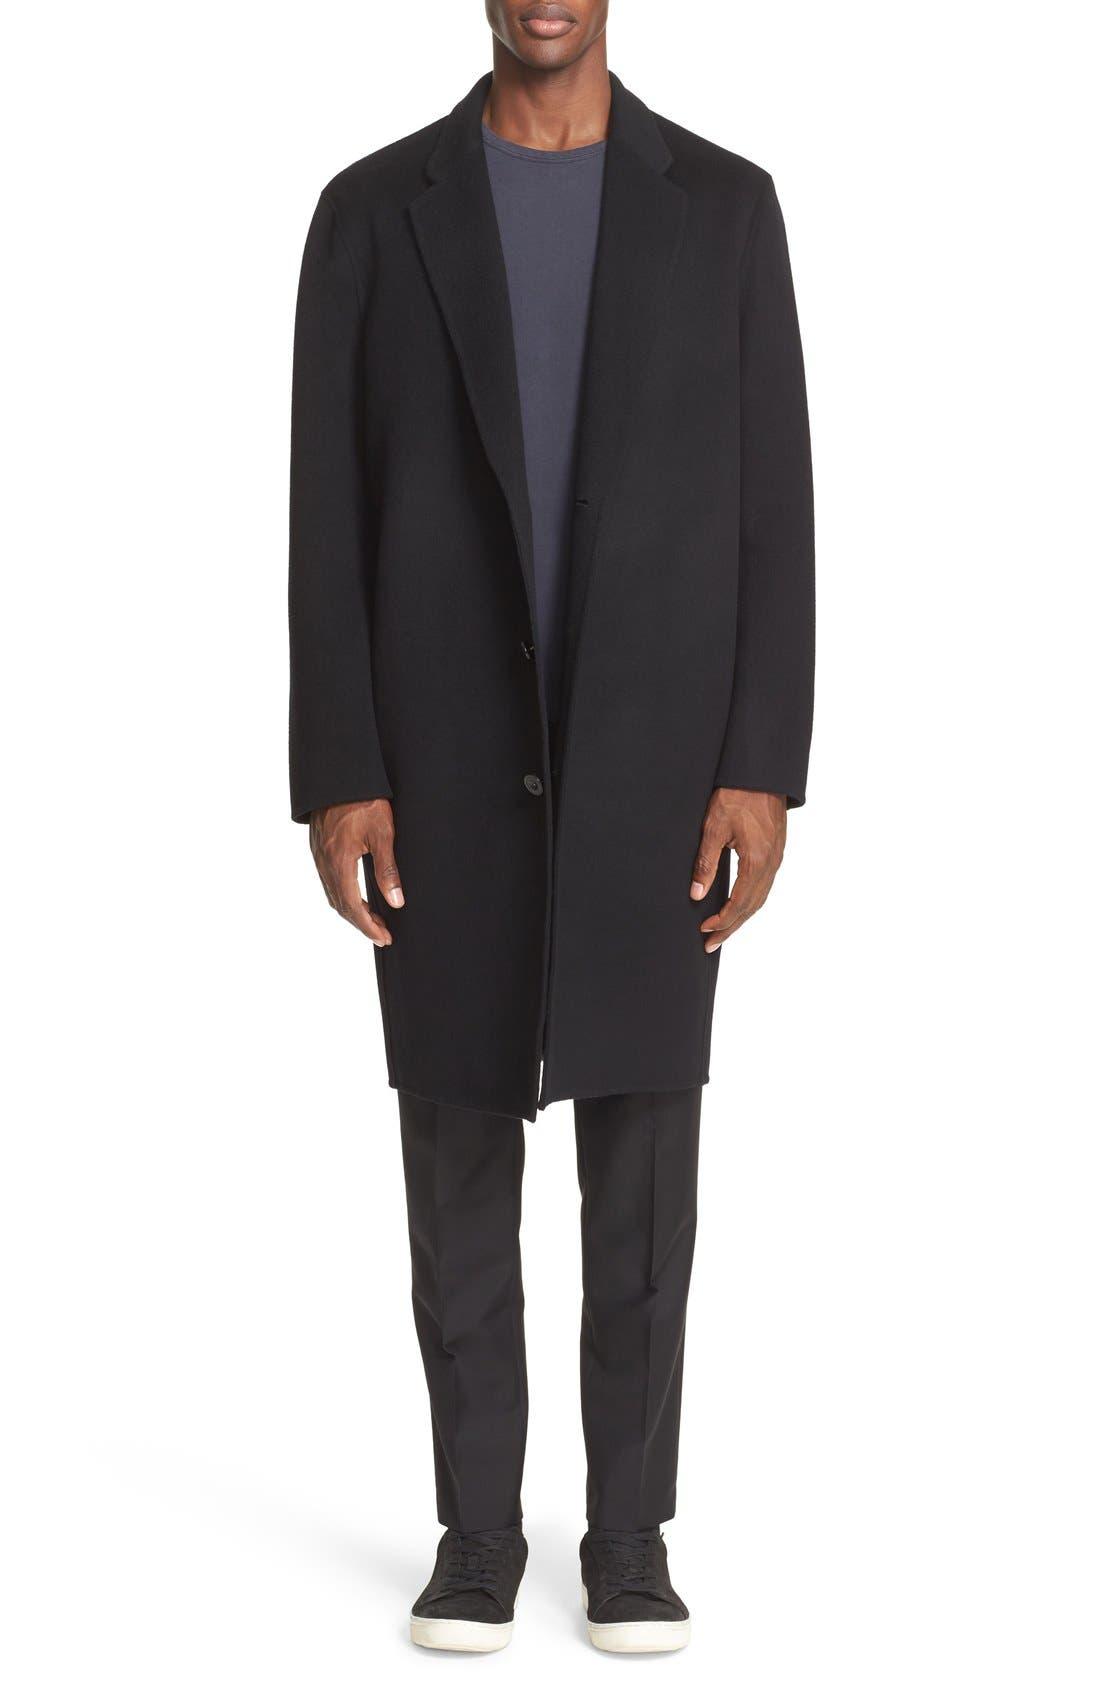 Charles Wool & Cashmere Coat,                             Main thumbnail 1, color,                             Black